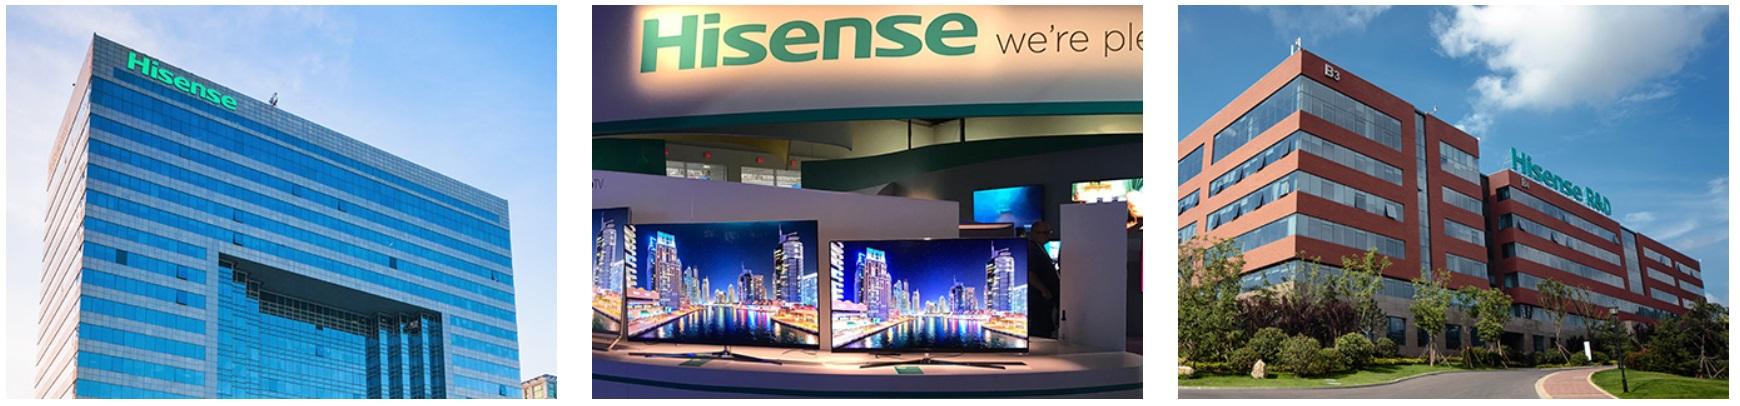 Hisense_50E6800_02